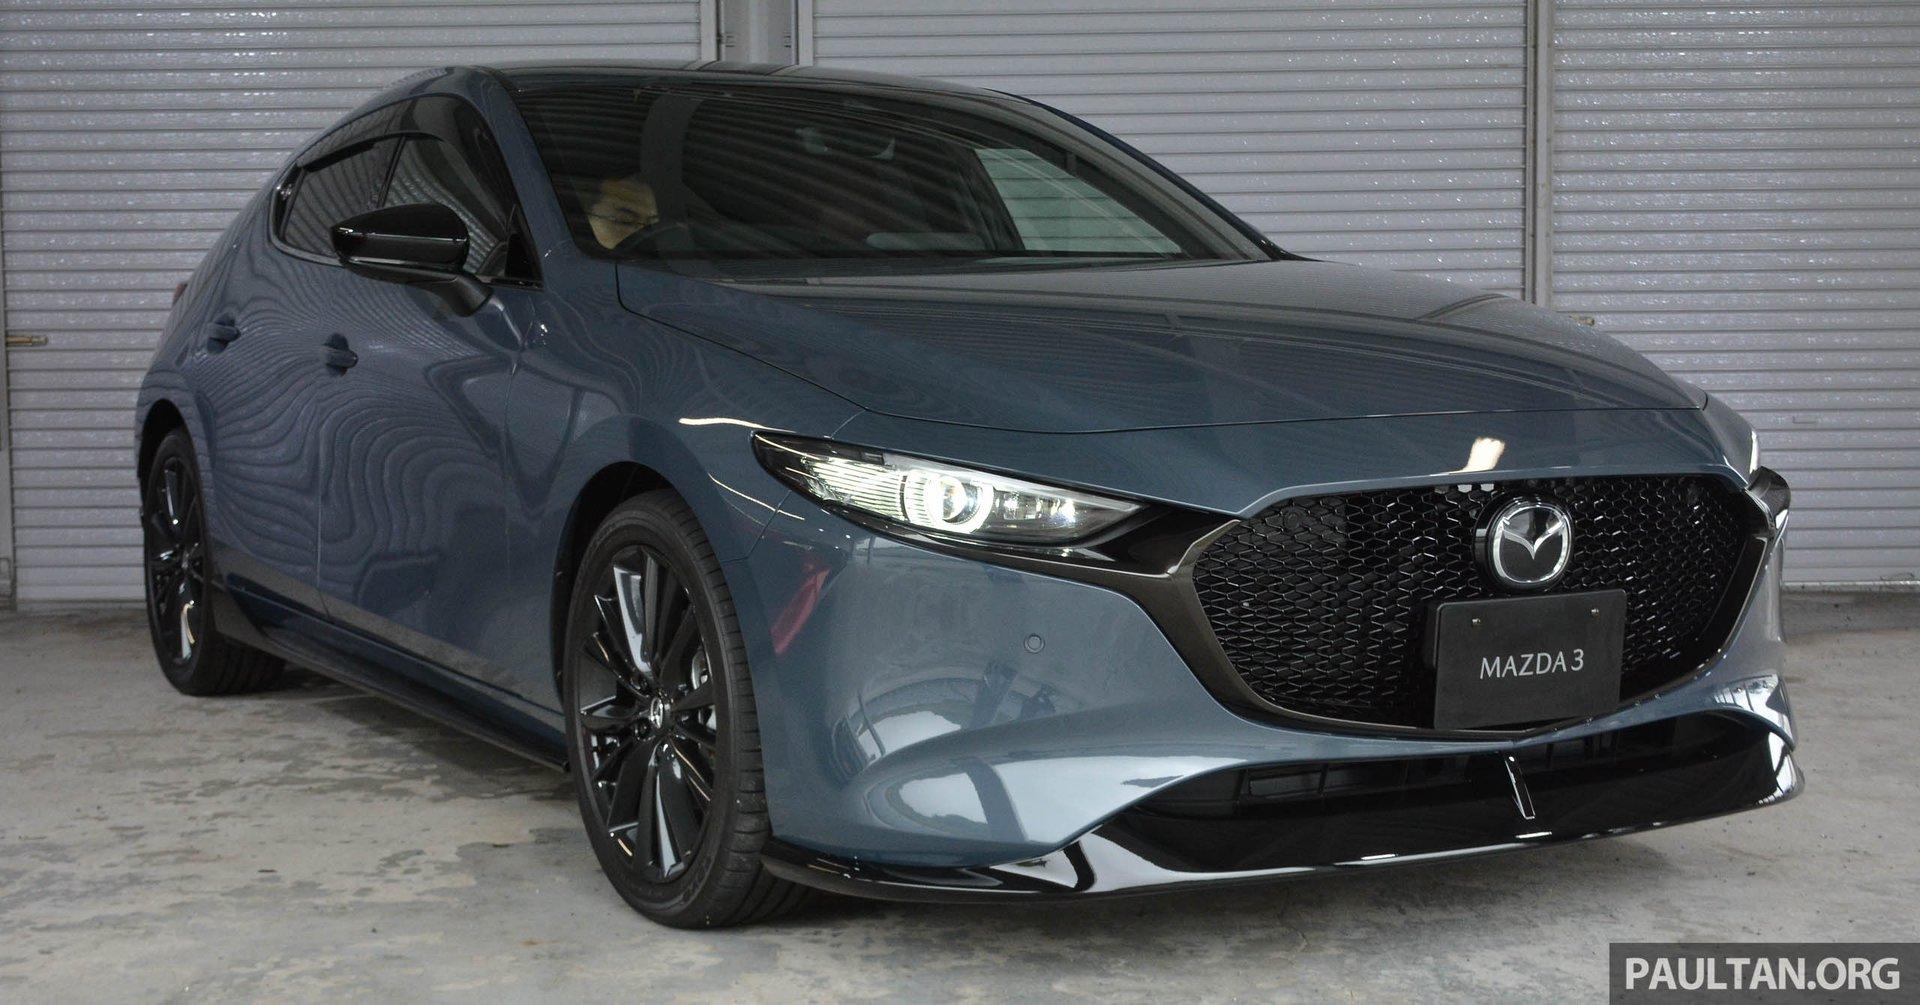 Kelebihan Kekurangan Mazda Jp Top Model Tahun Ini